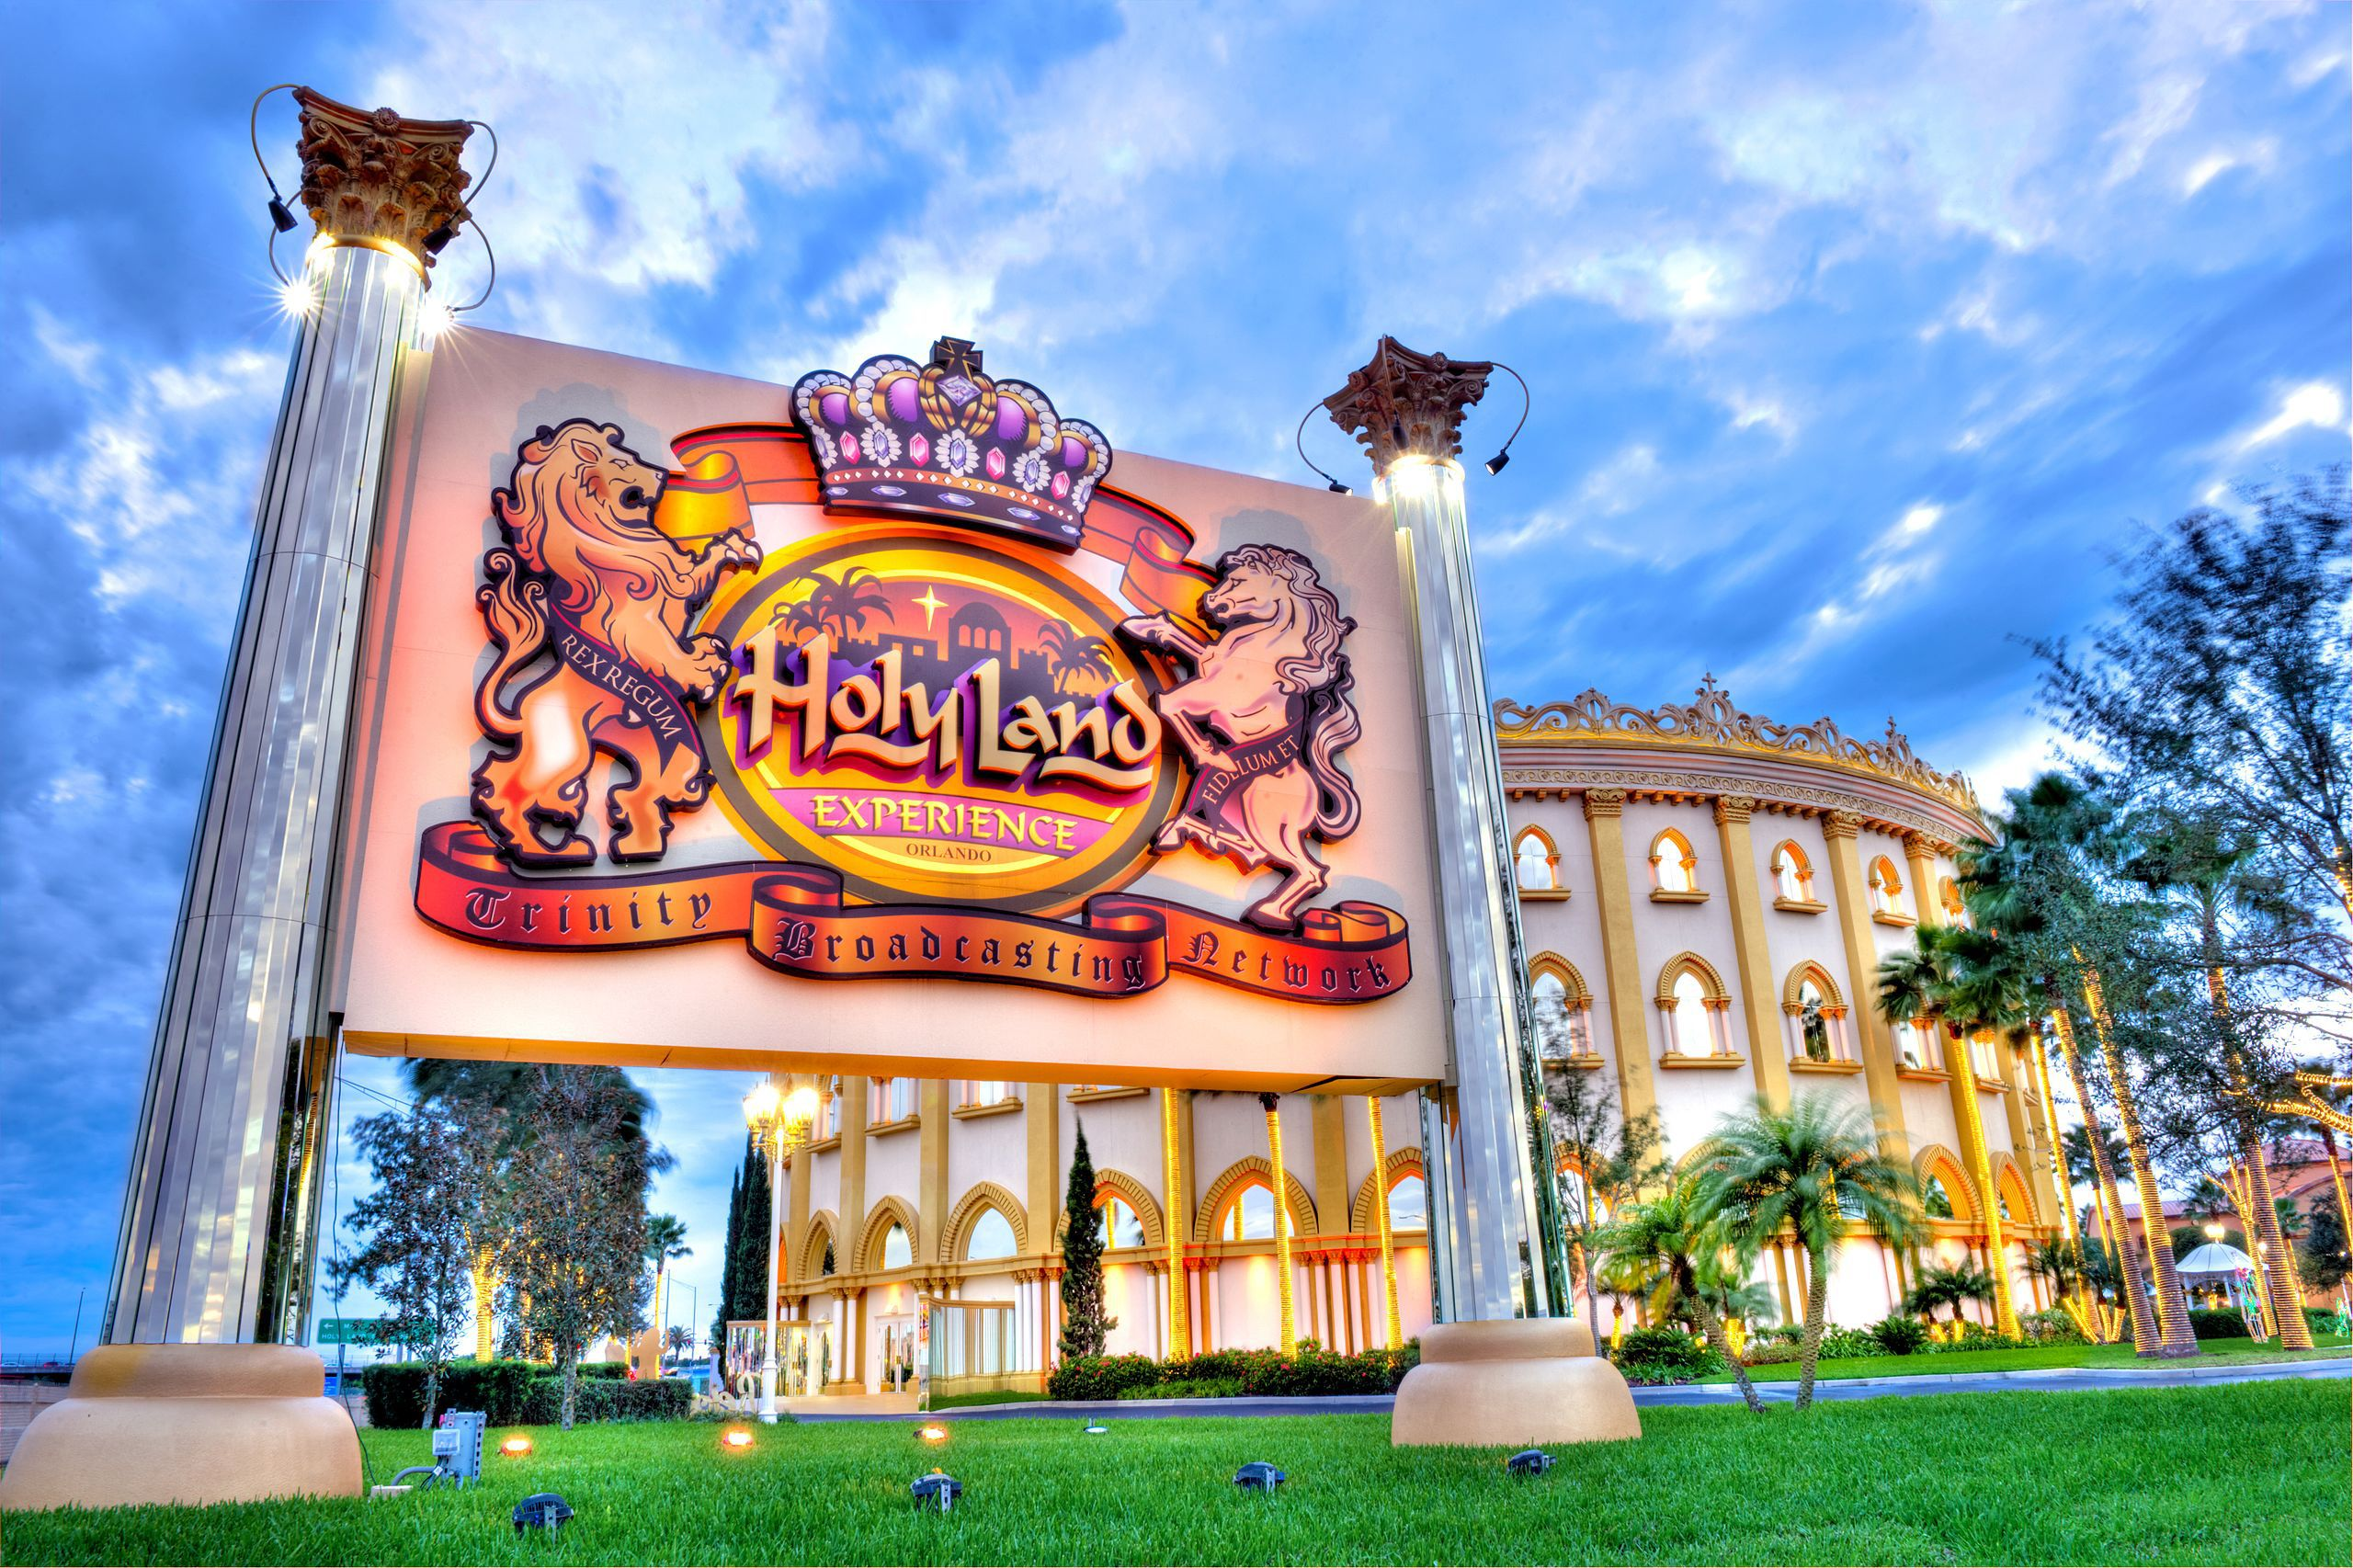 Holyland Experience Orlando